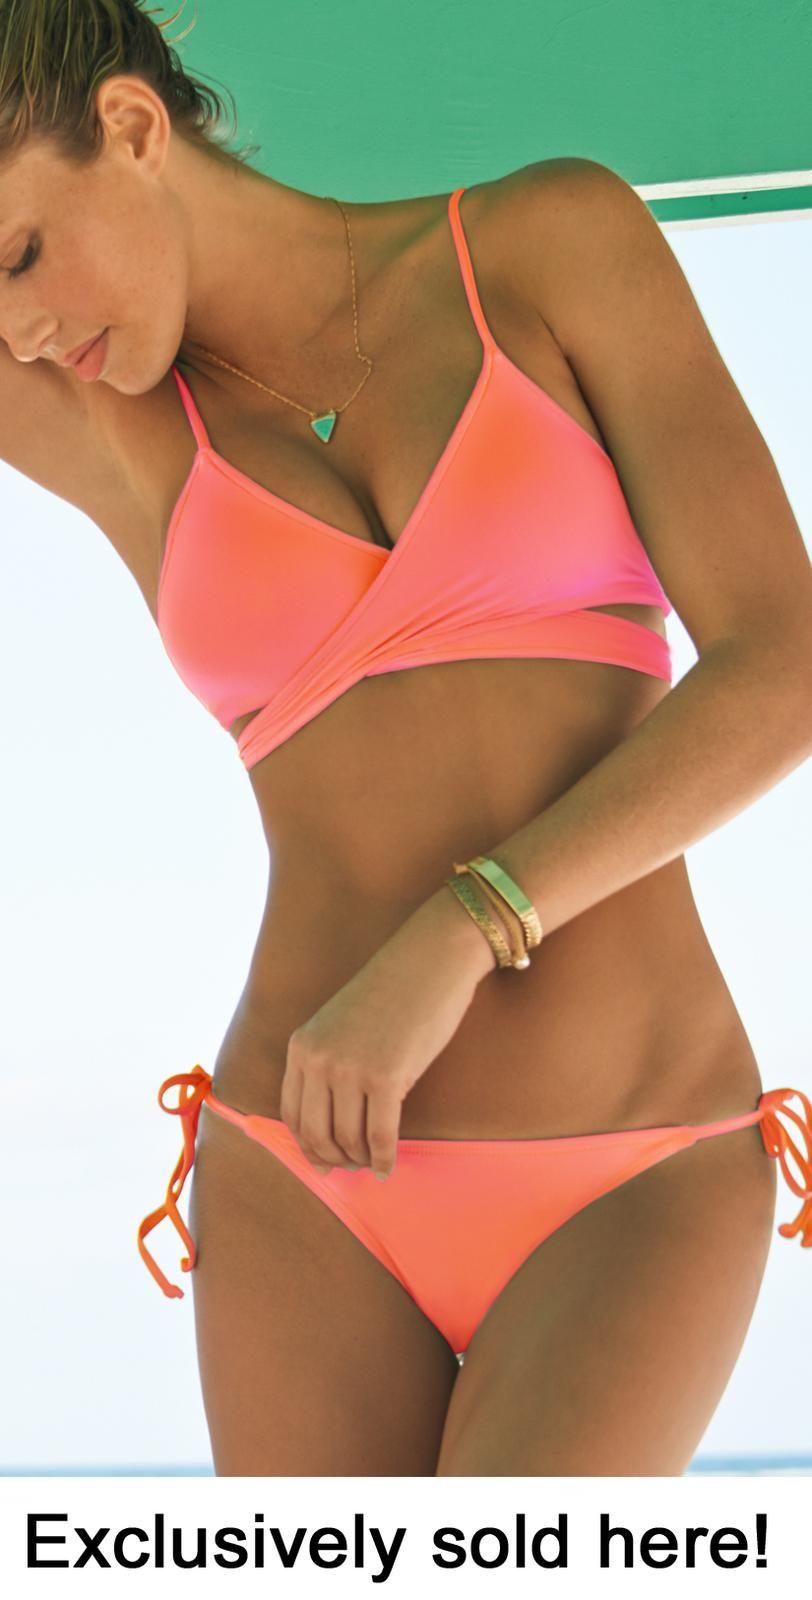 98bd586cd704f South Beach Swimsuits - Vix Swimwear, Gottex Swimwear, Vitamin A Swimwear,  Ann Cole Swimwear. L Space 2014 EXCLUSIVE Electric Coral Chloe Wrap ...